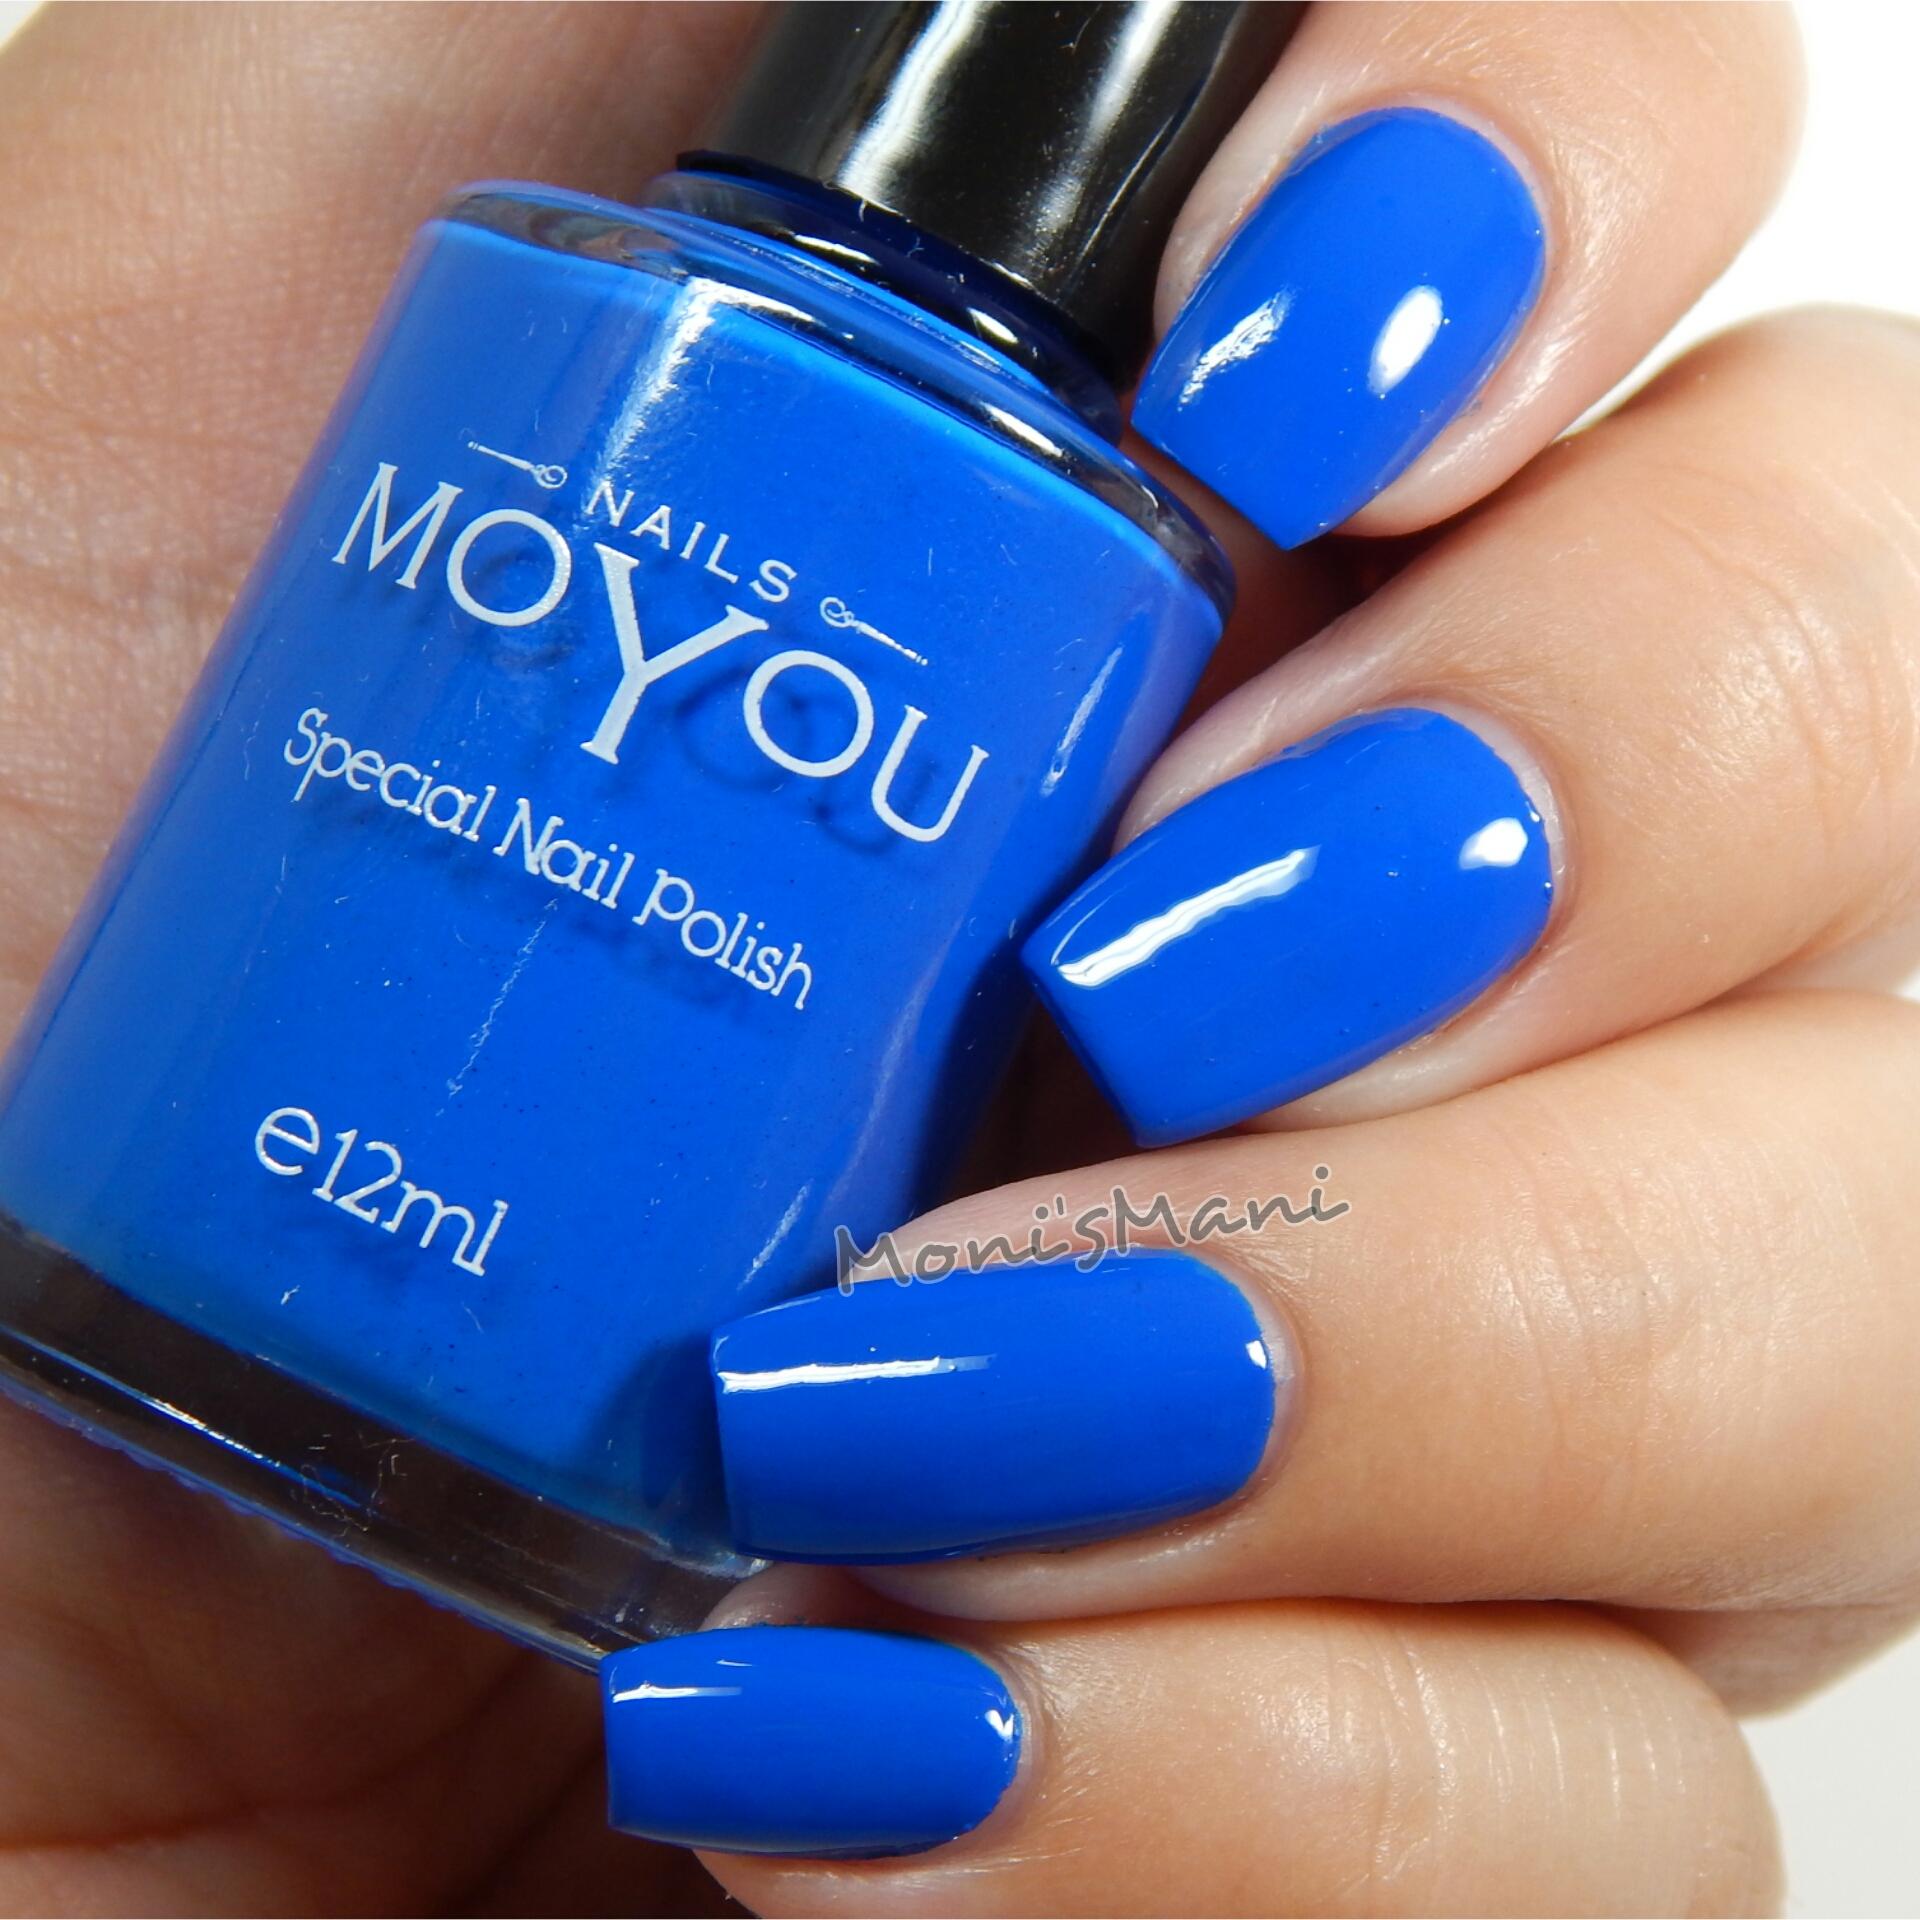 MoYou Nails USA Blue Nail Polish | Monismani